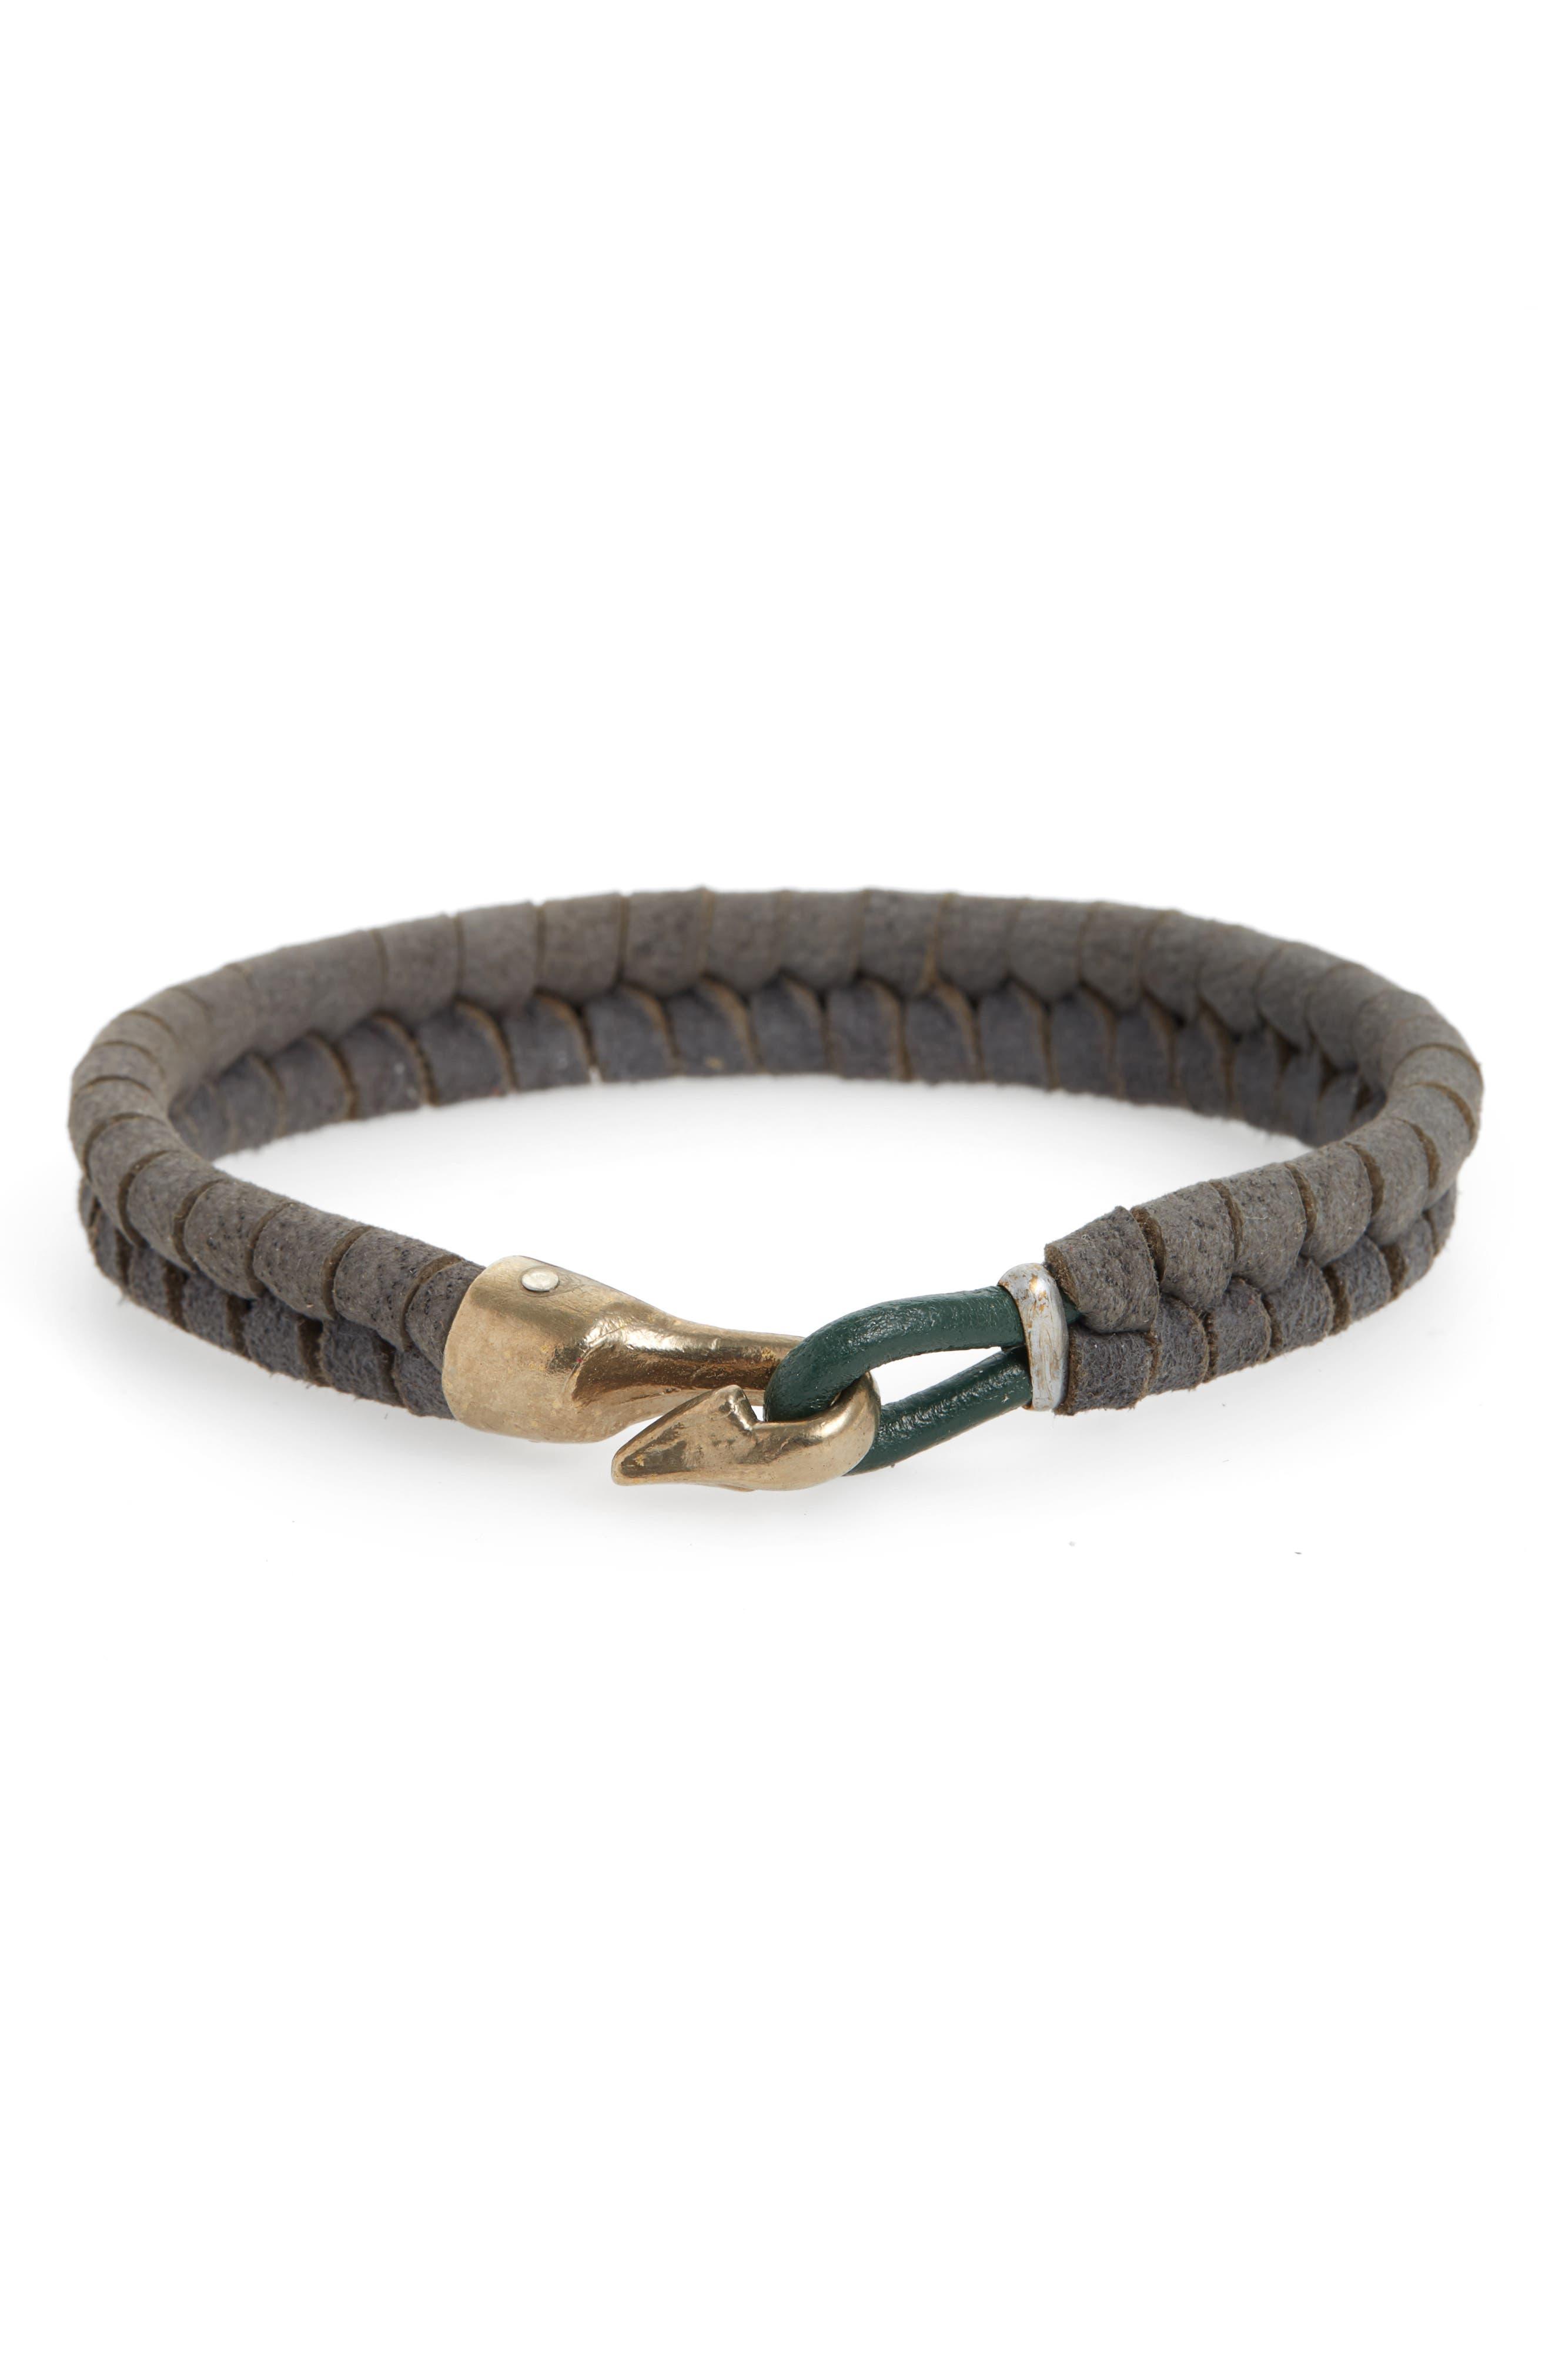 Harpoon Bracelet,                             Main thumbnail 1, color,                             GREY